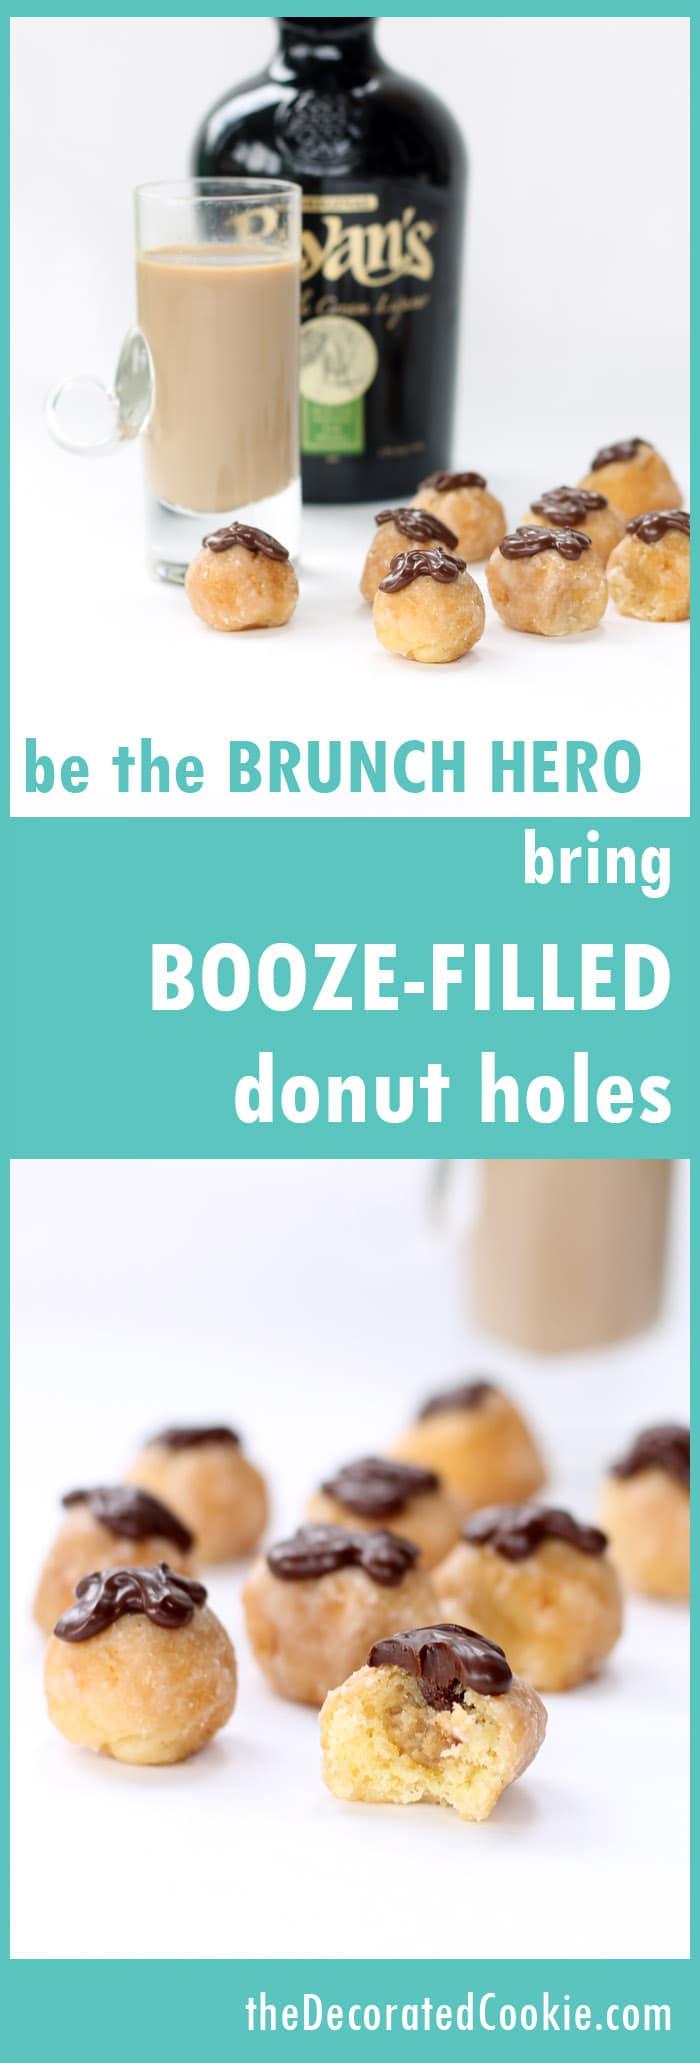 booze-filled donut holes - Irish Cream liquor filled donut holes for brunch